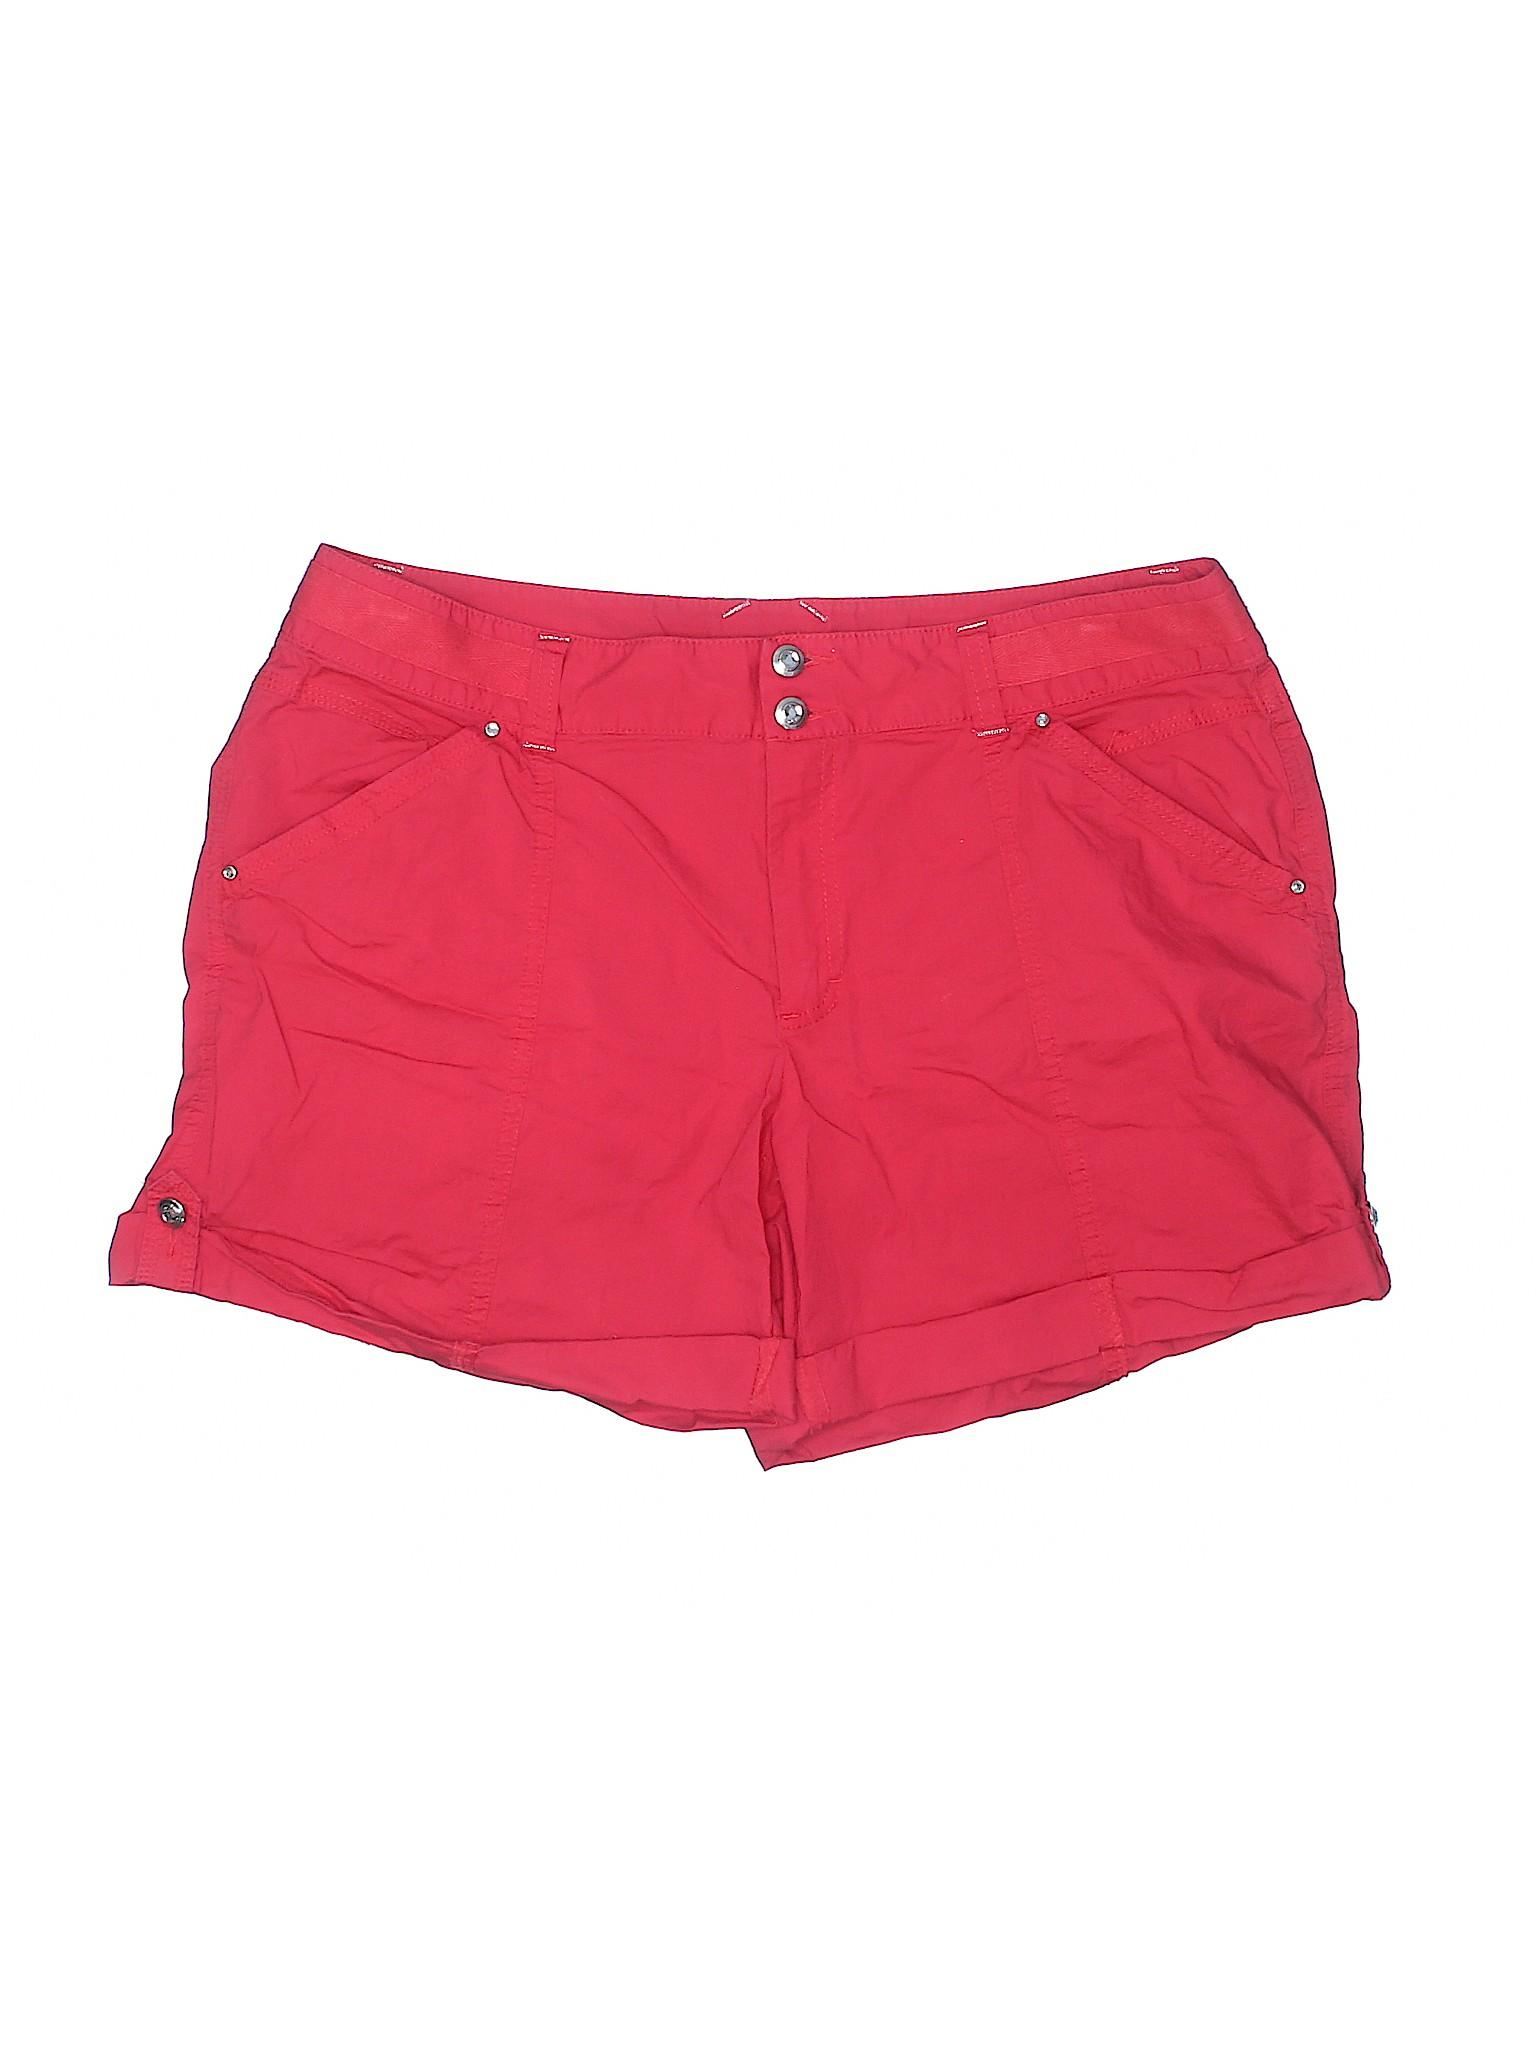 Leisure International Shorts Concepts winter Khaki INC rHqnprvR